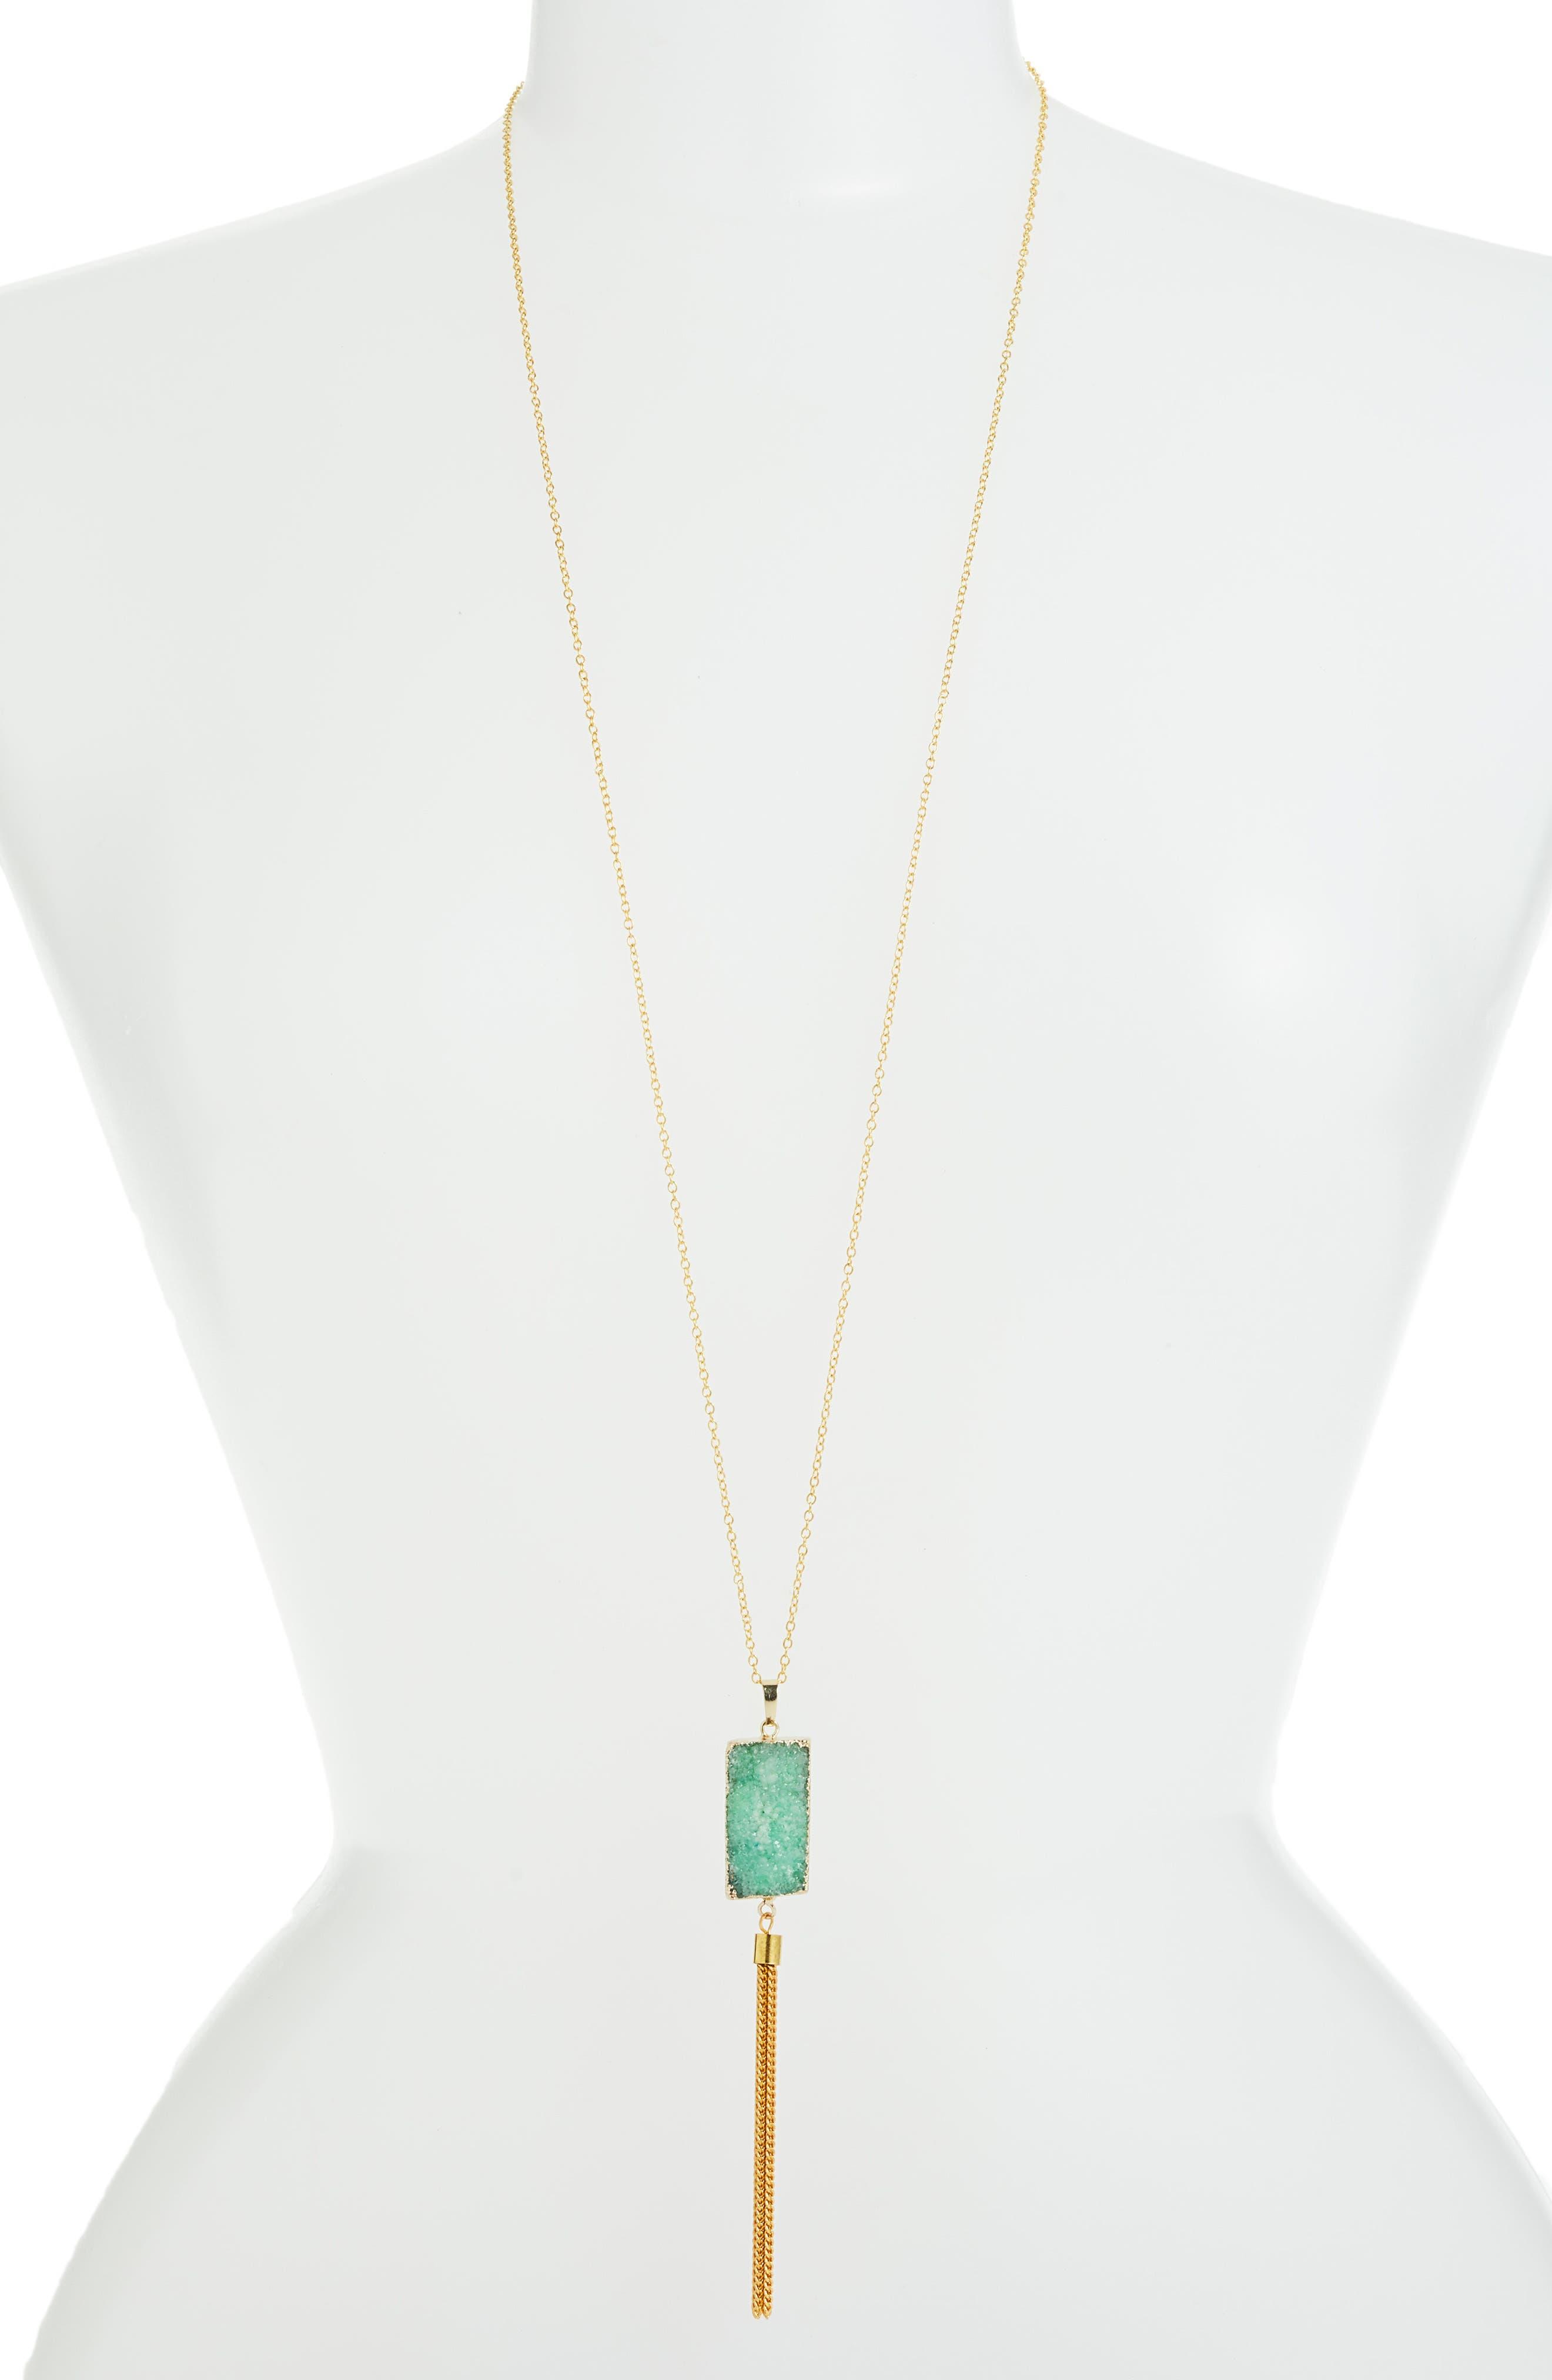 Elise M. Carmela Drusy Pendant Necklace